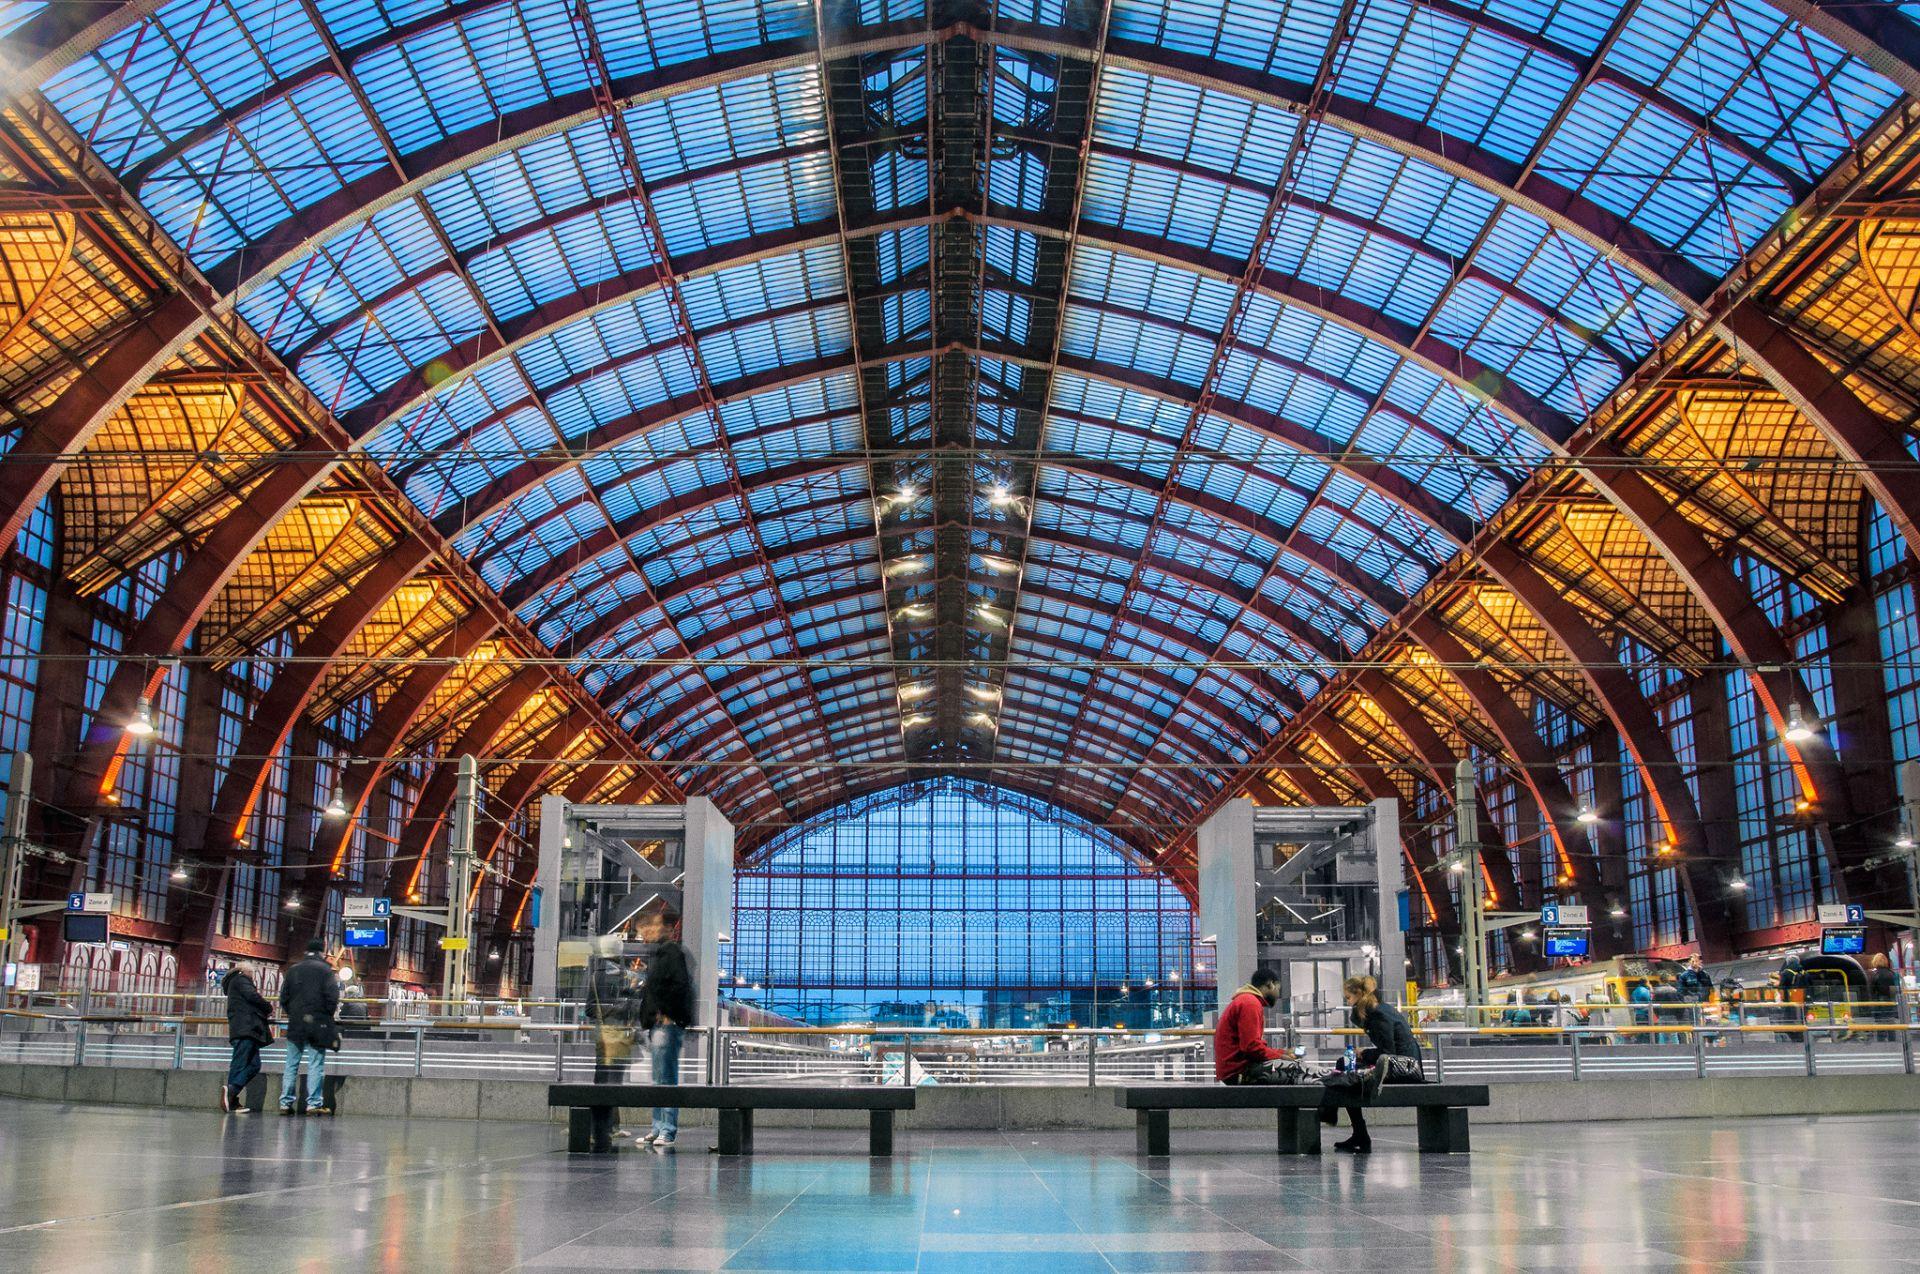 Majestic Train Stations